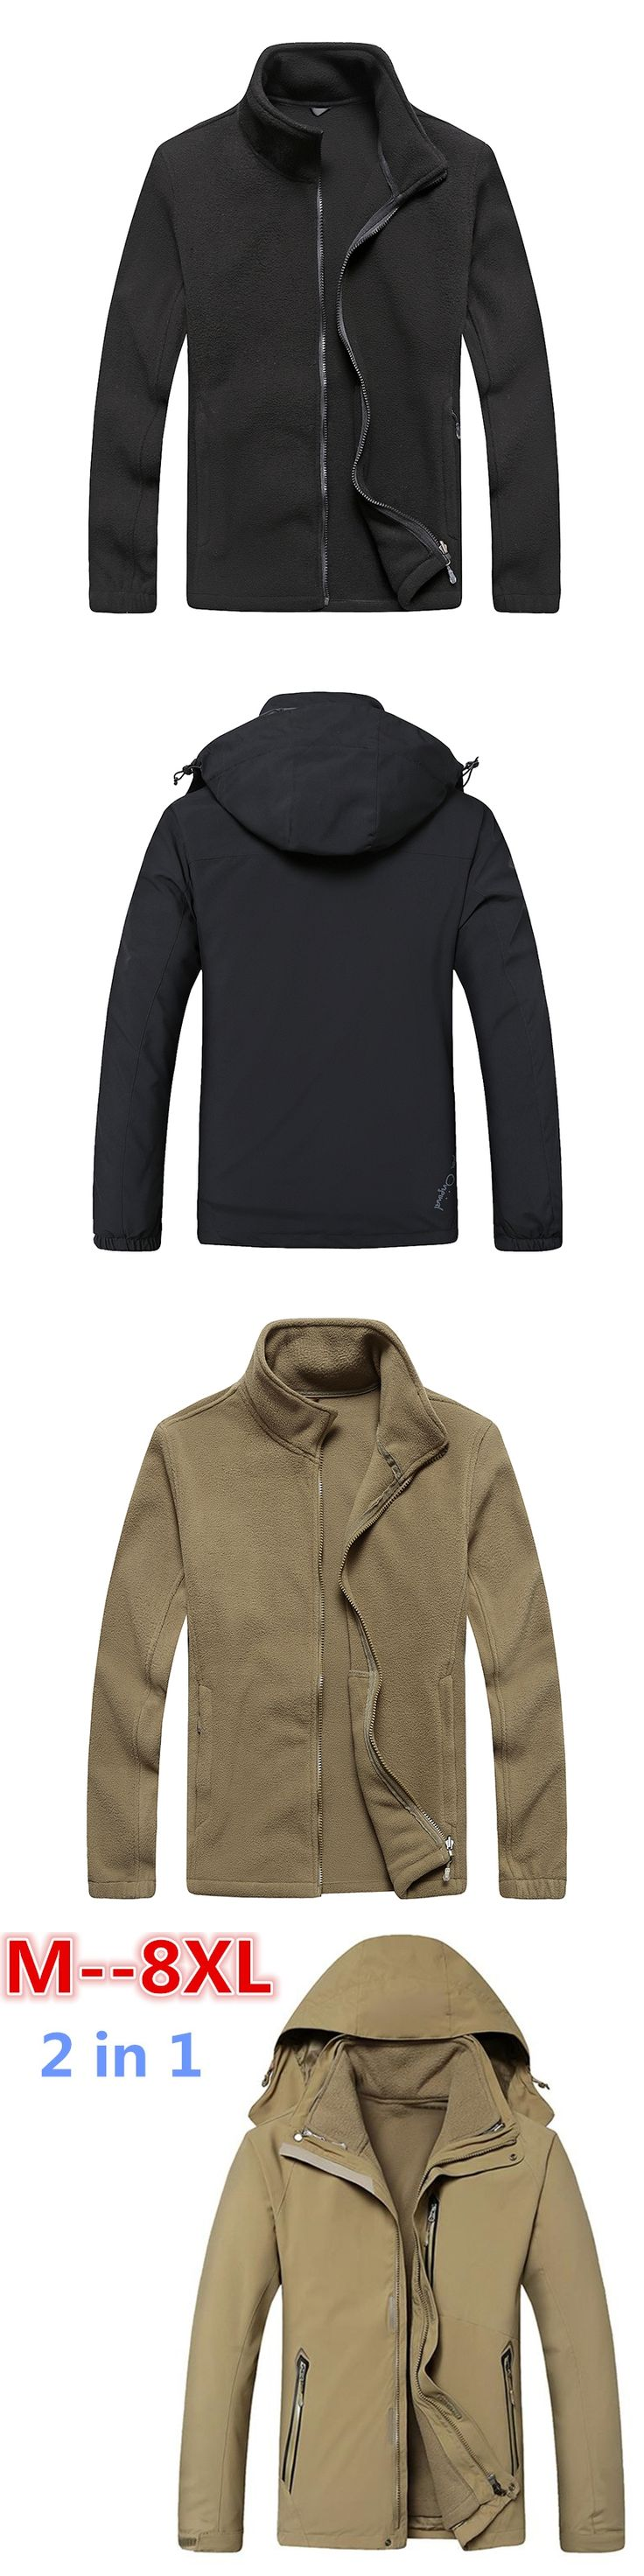 10XL 8XL 6XL Mens 2 In 1 Parkas Solid Hooded Winter Jacket Man Casual Long Padded Overcoat Streetwear Jaqueta MasculinaInverno